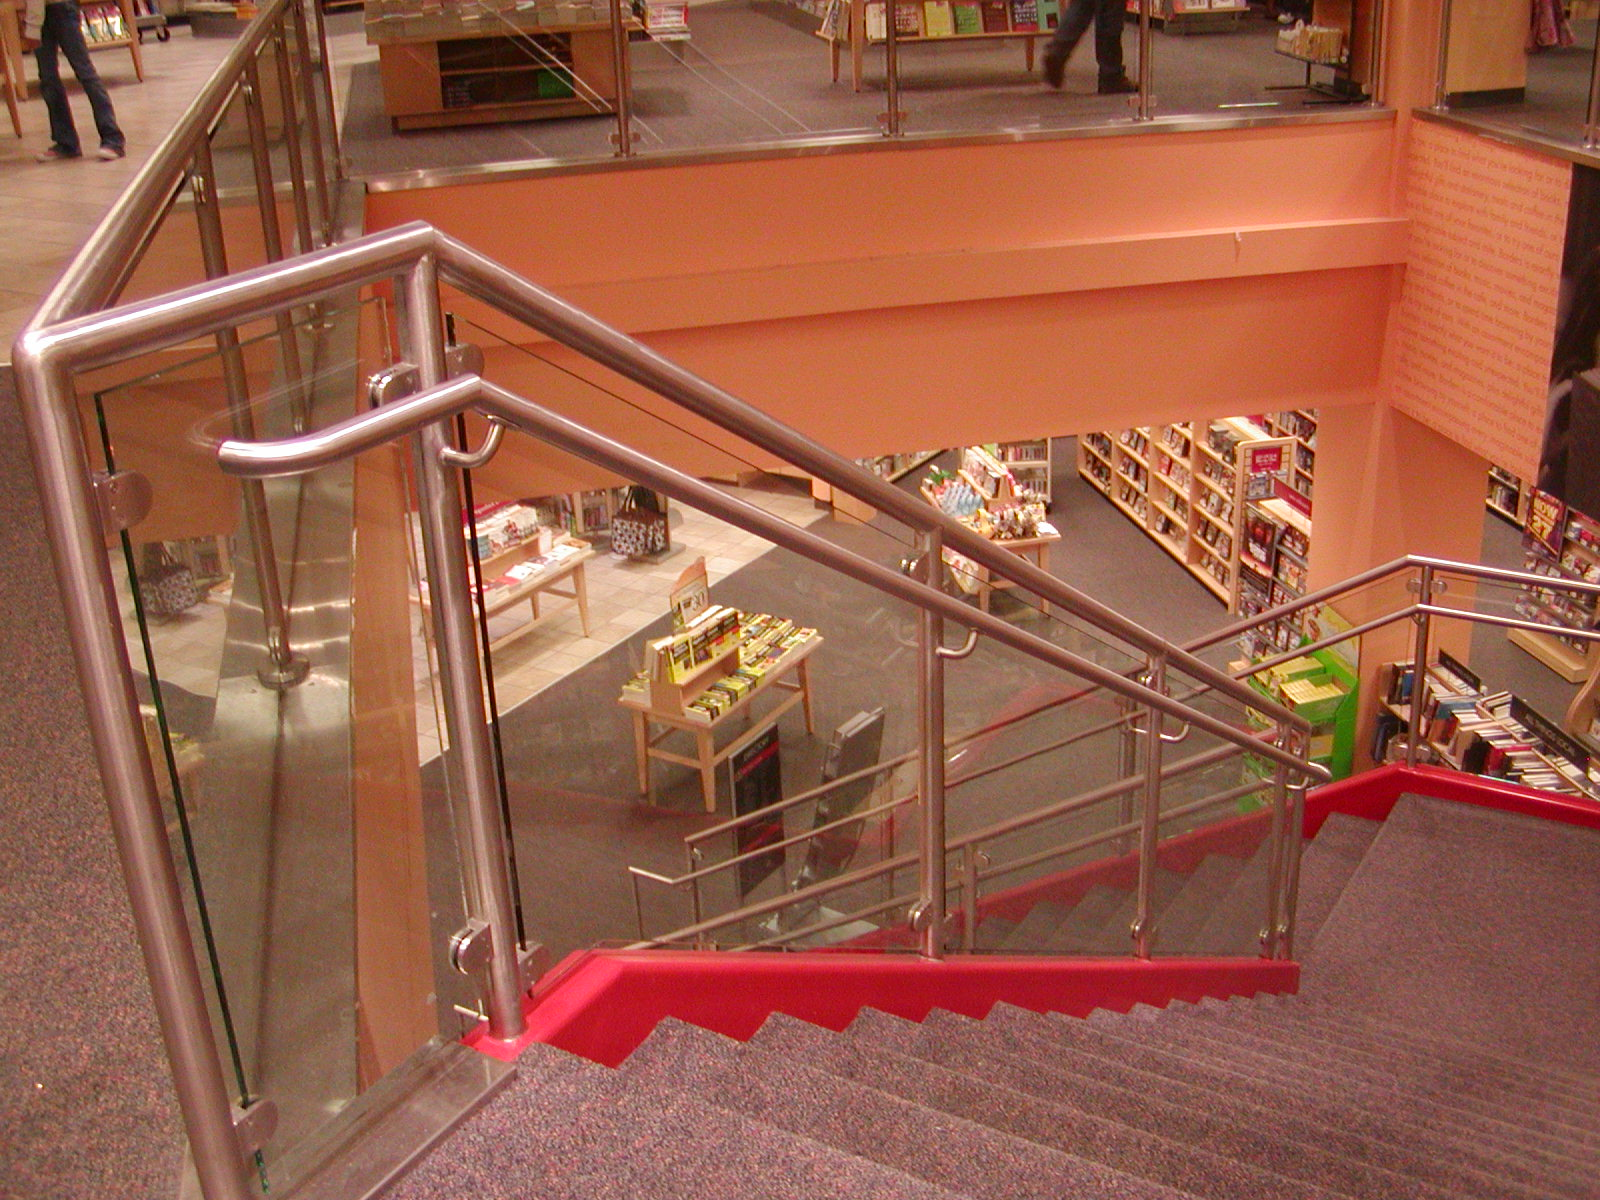 Labelscar: The Retail History BlogThe Galleria; Houston, Texas ...